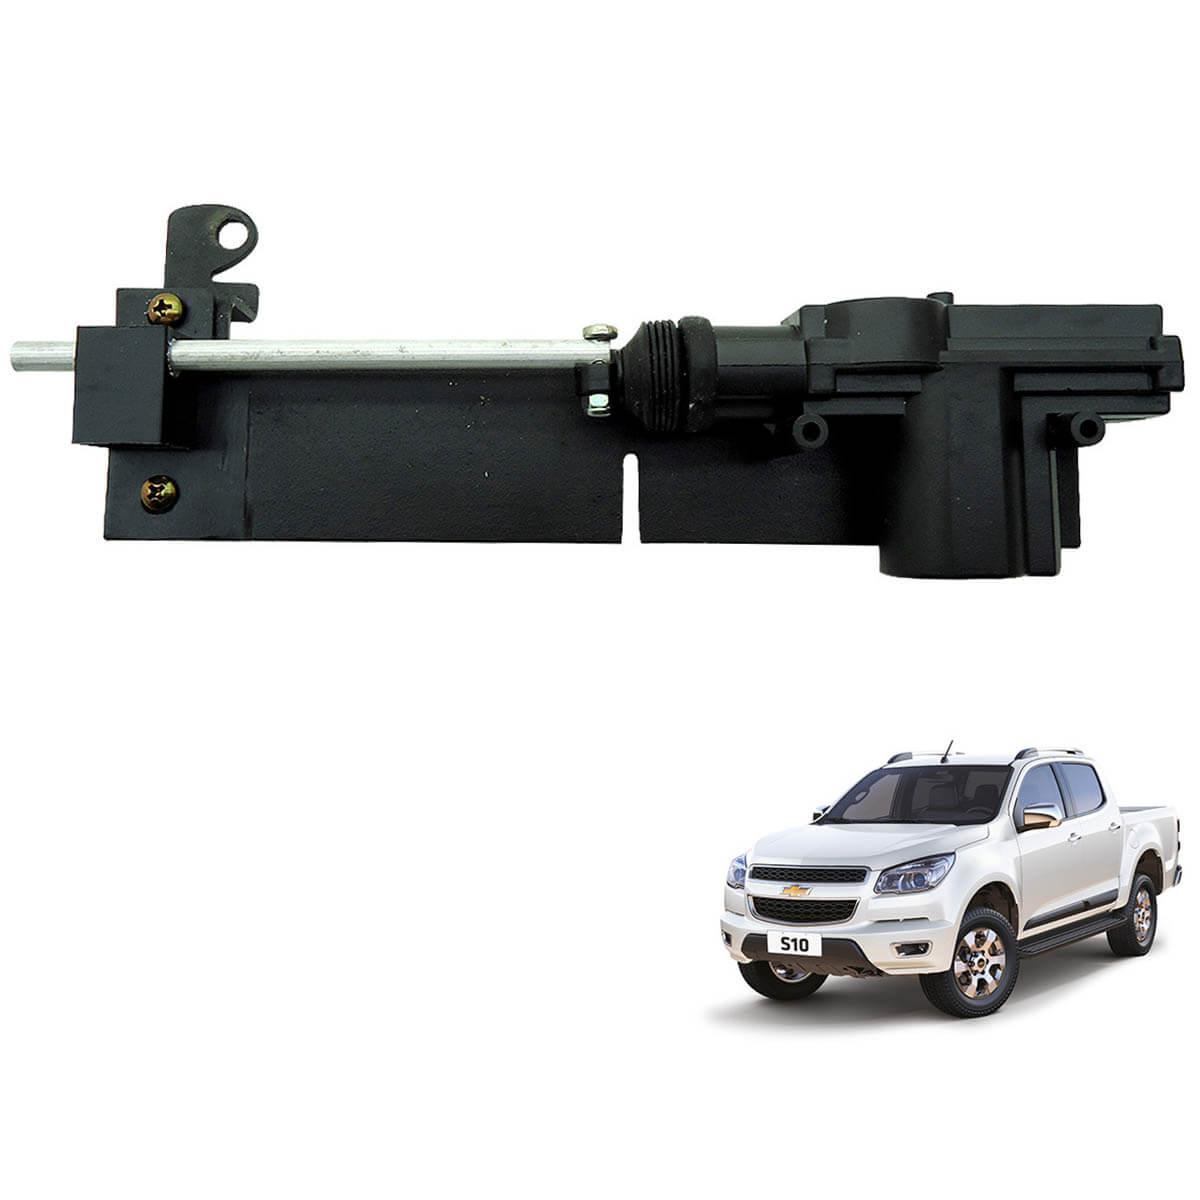 Trava tranca elétrica tampa caçamba Nova S10 2012 a 2018